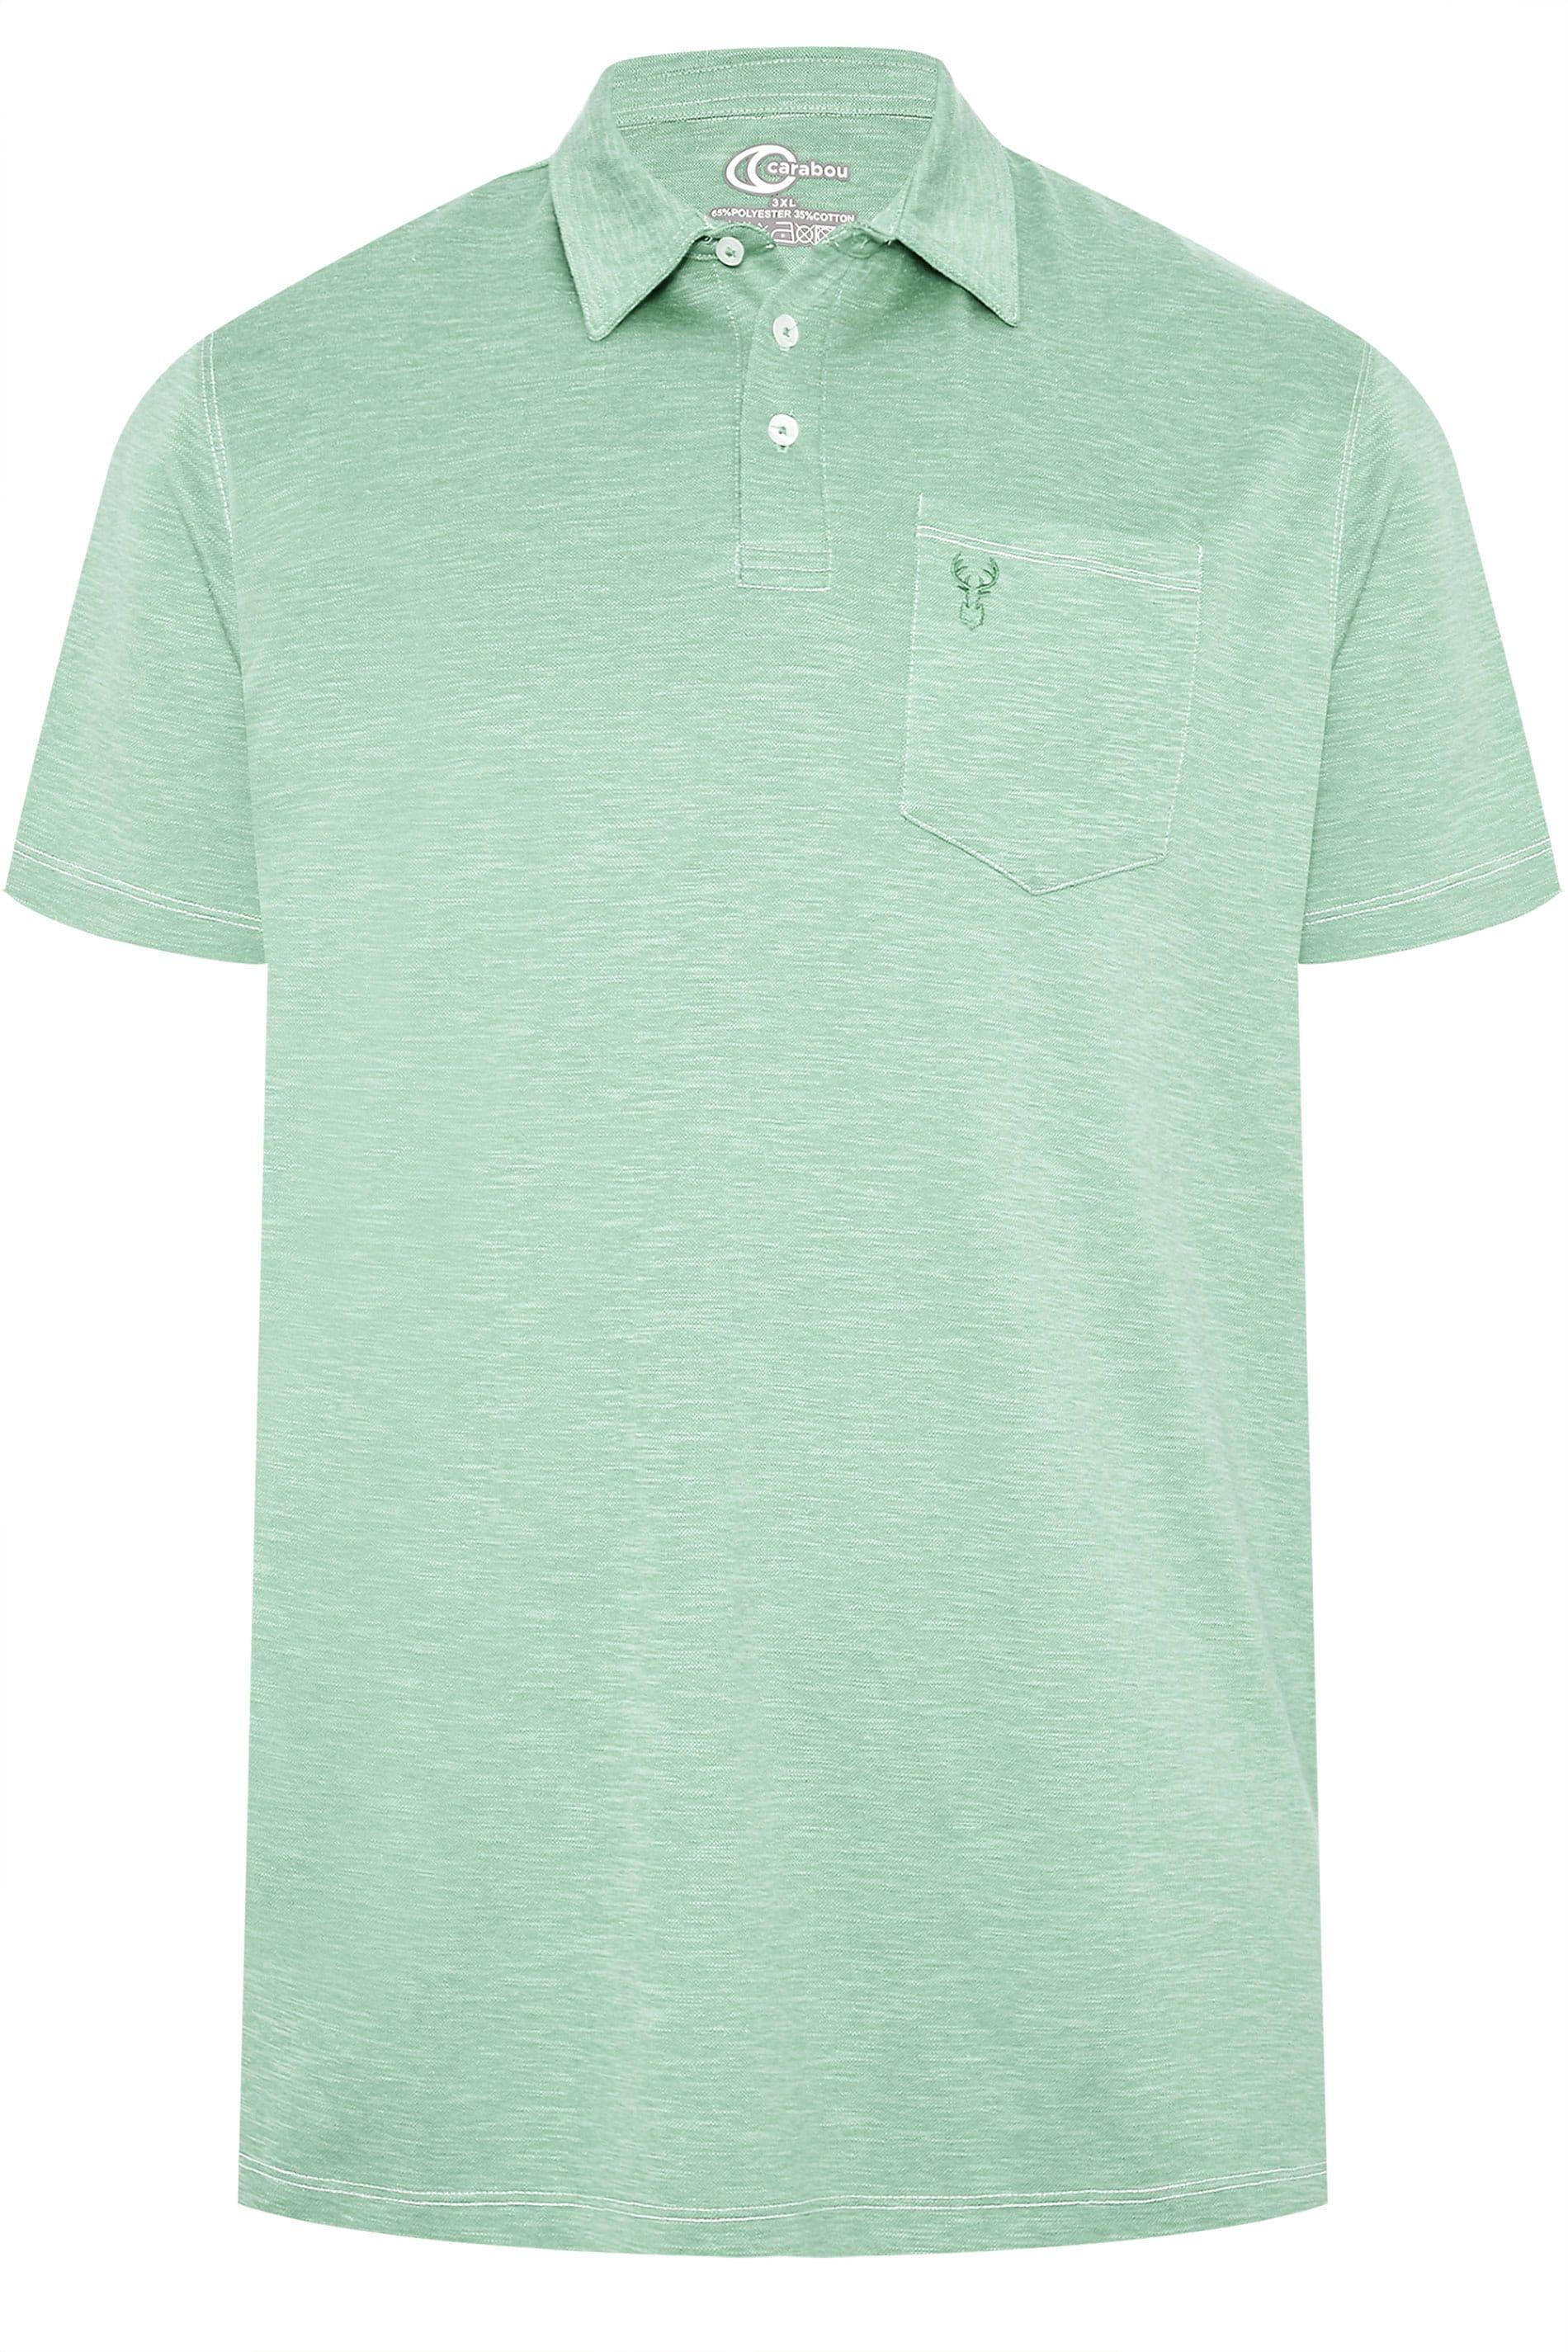 CARABOU Aqua Green Marl Polo Shirt